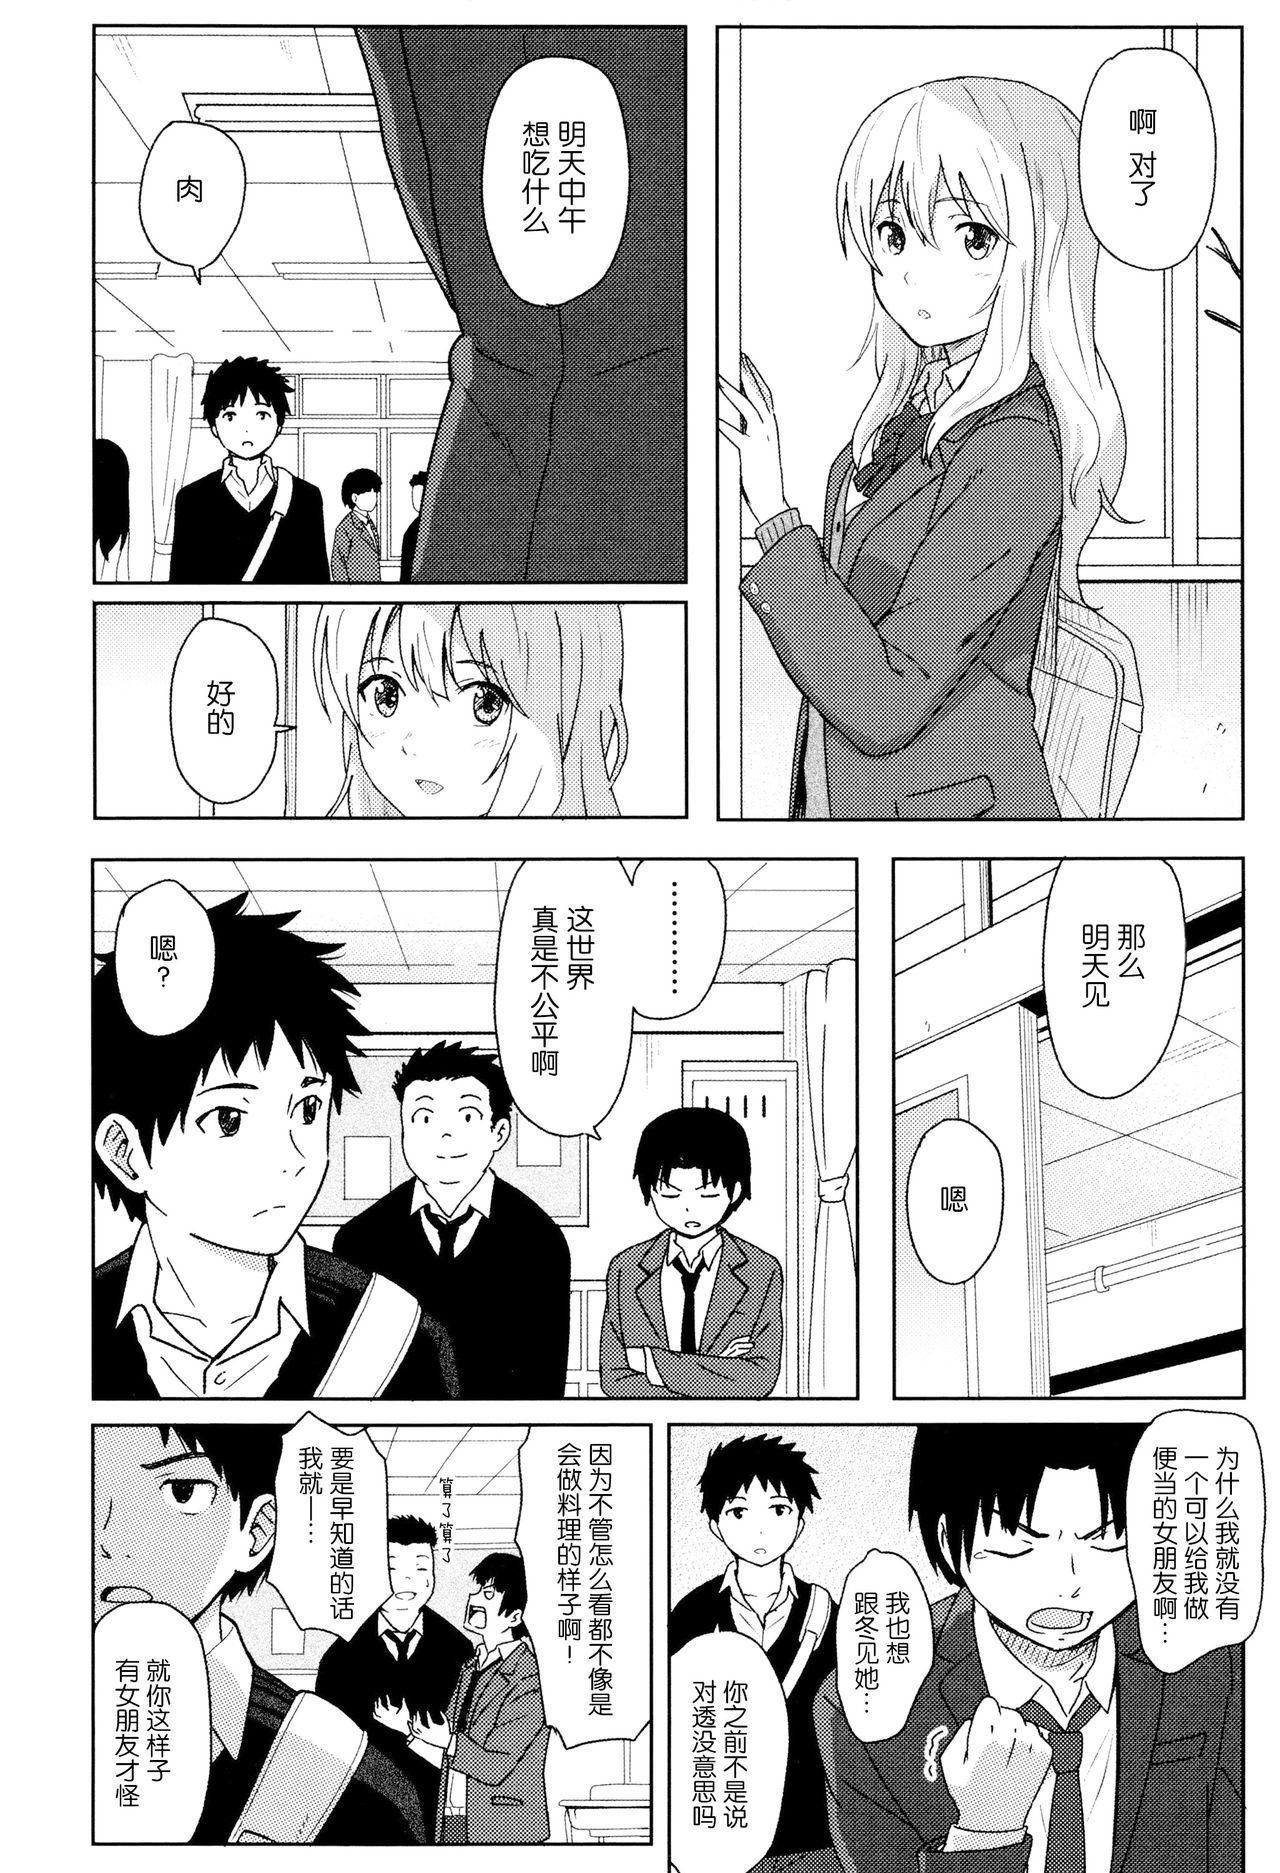 Tokubetsu na Mainichi - Special daily 6